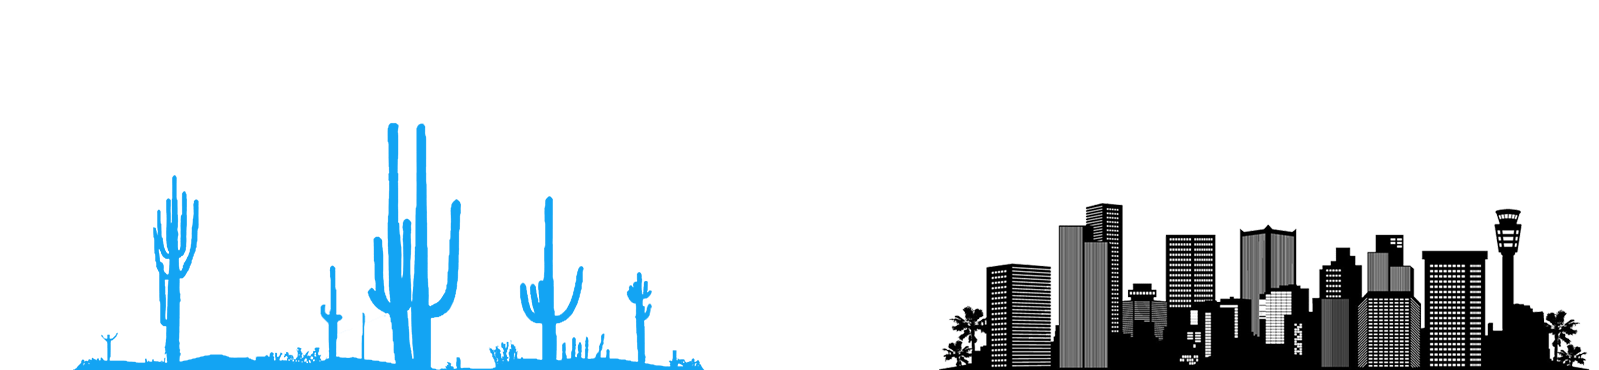 desert and city icon